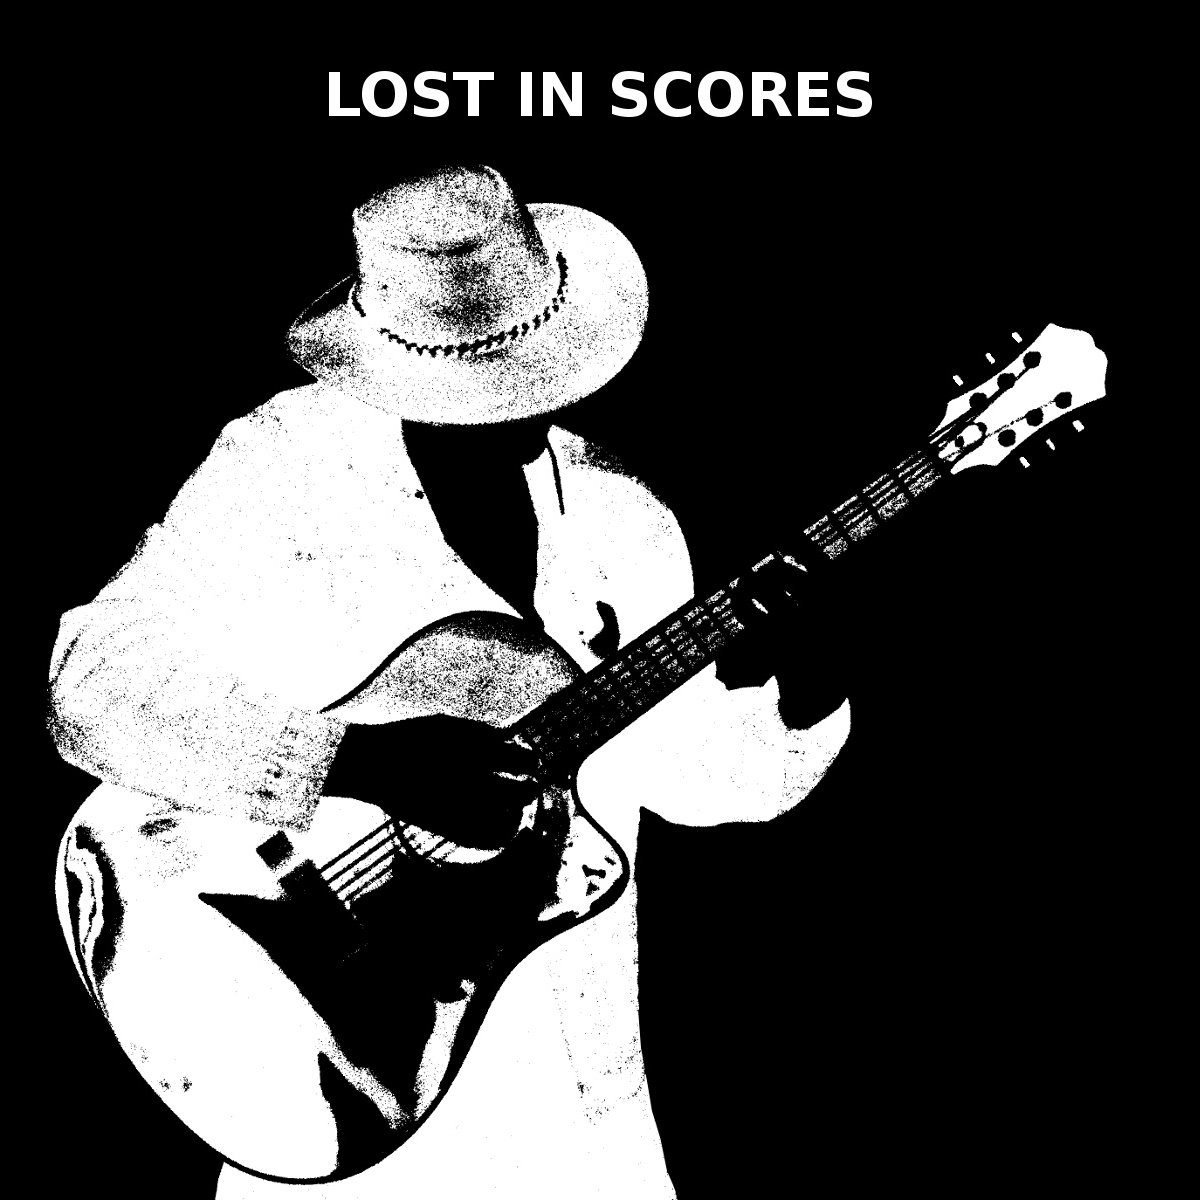 Southern Rock Guitar Hip Hop Rap Beat Instrumental #2 | Lost